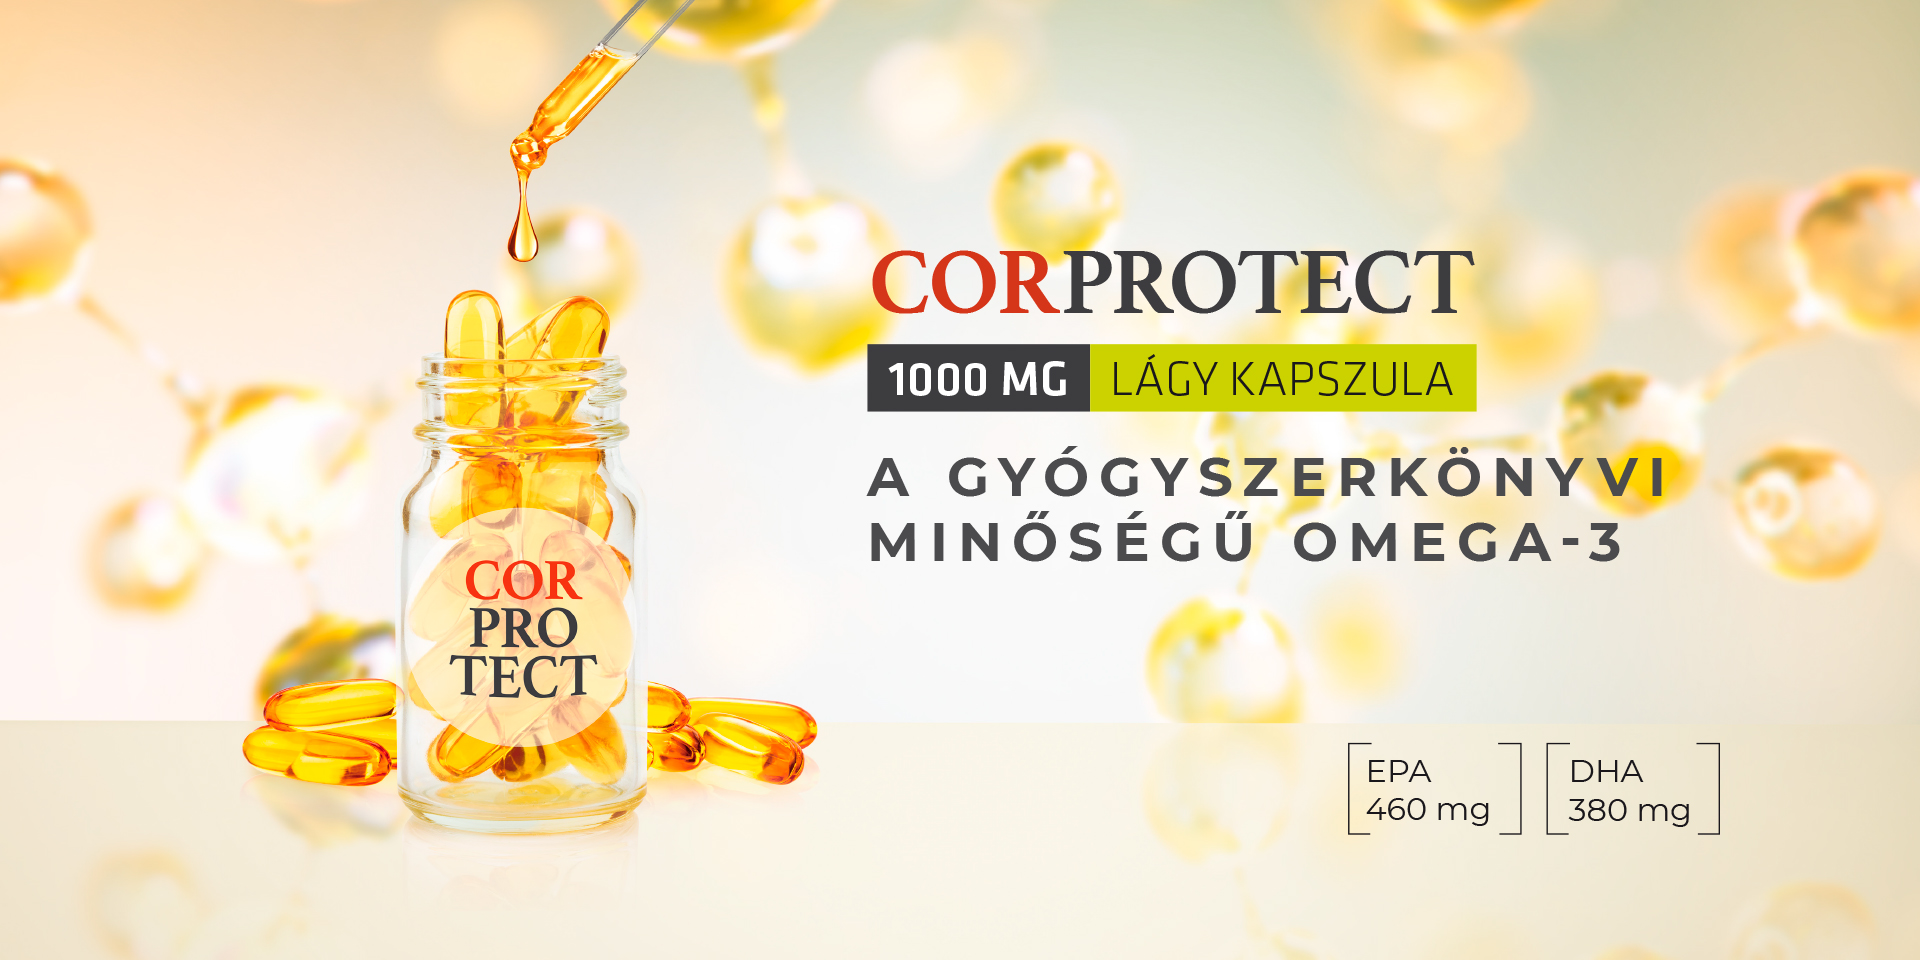 Corprotect 1000 mg lágy kapszula